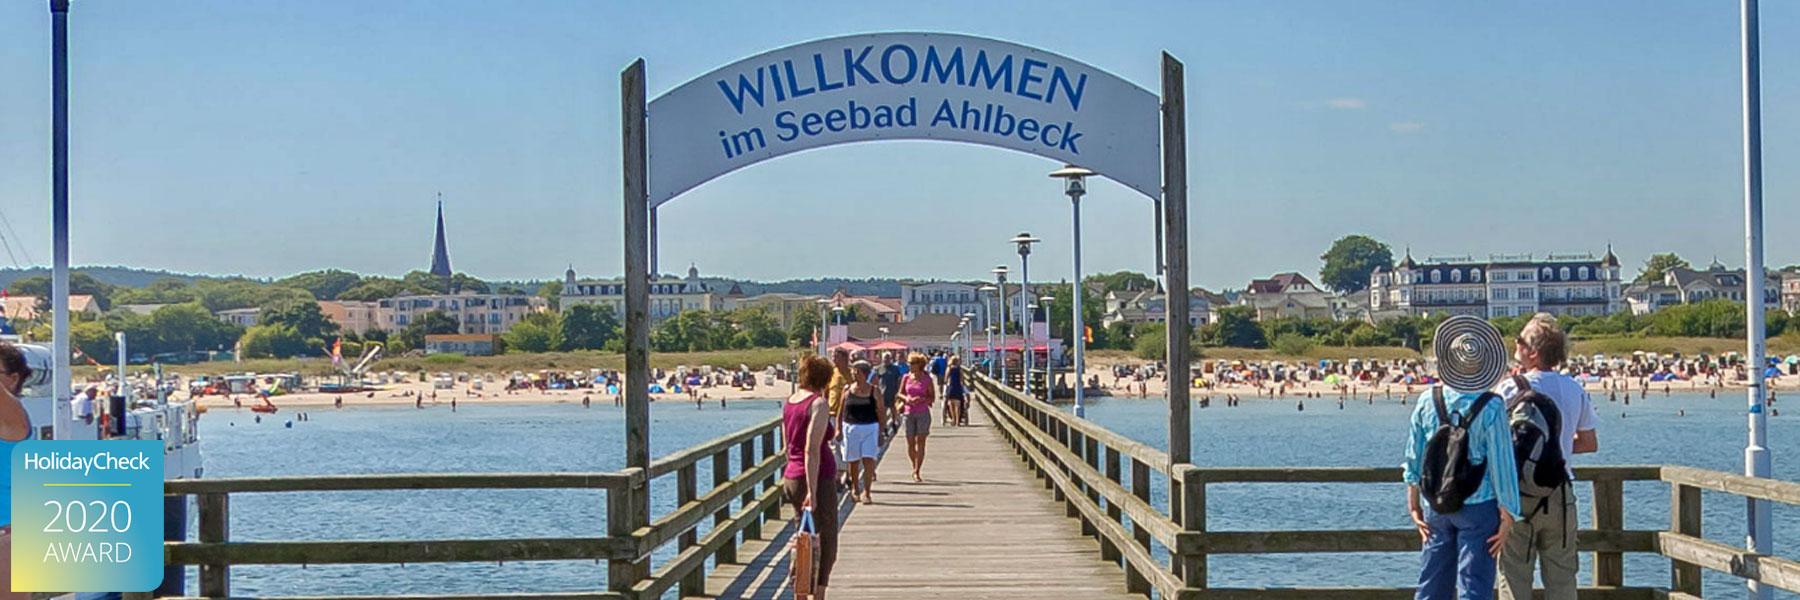 "Seebrücke Ahlbeck - Aparthotel ""Strandhus"" Familie Herrgott"